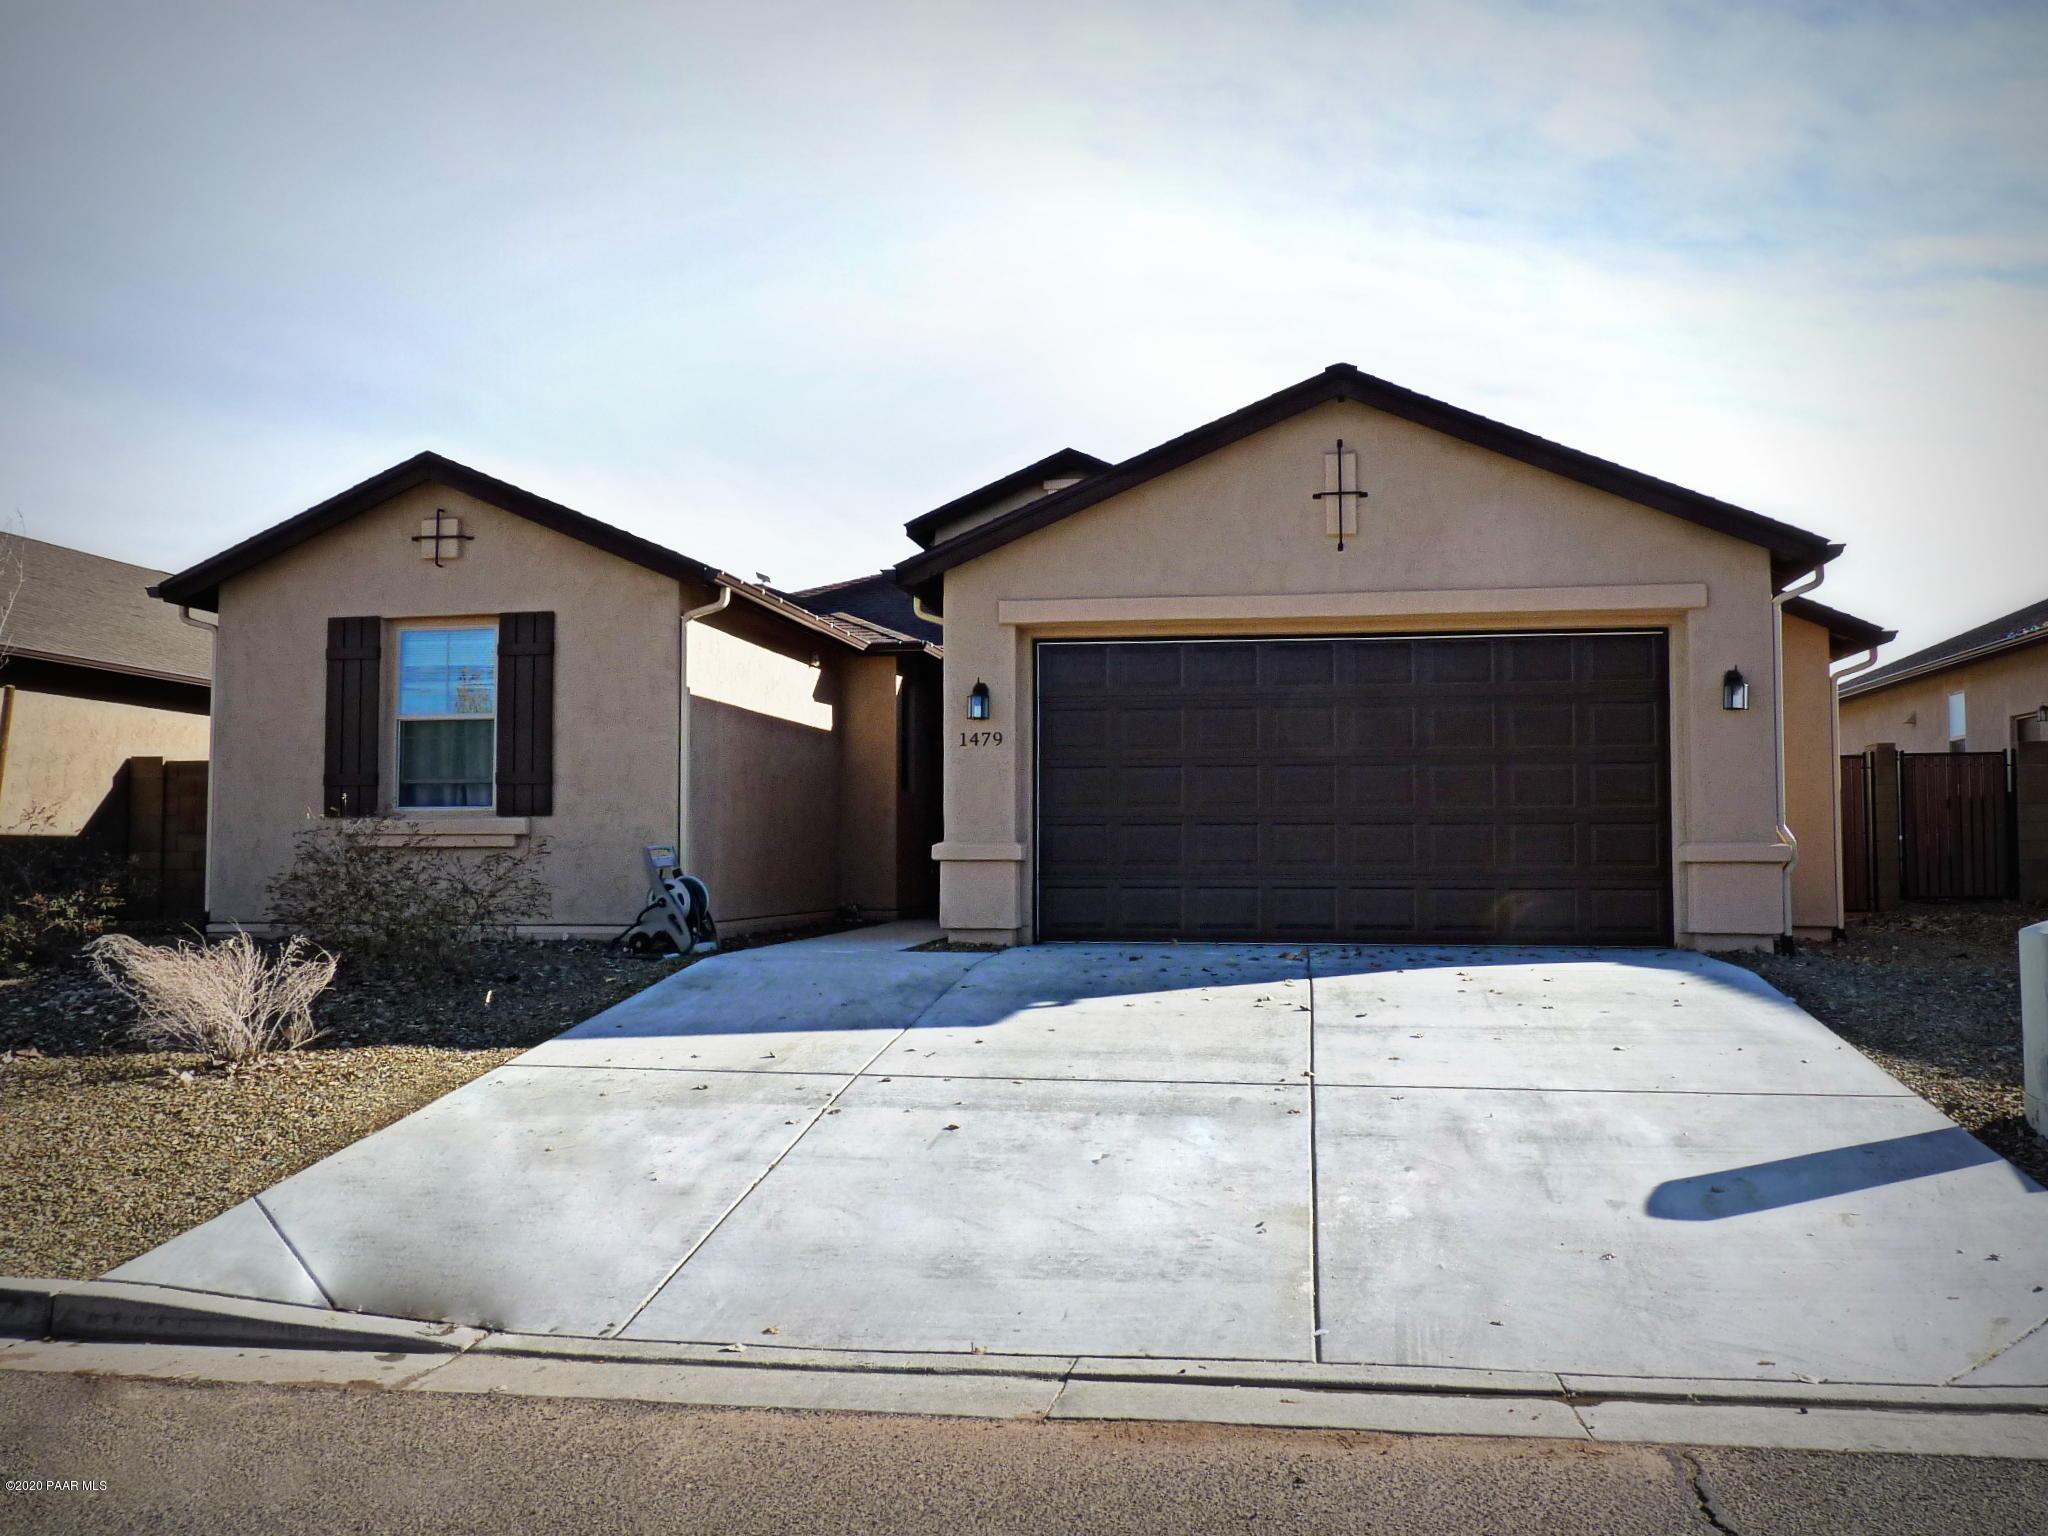 Photo of 1479 Essex, Chino Valley, AZ 86323